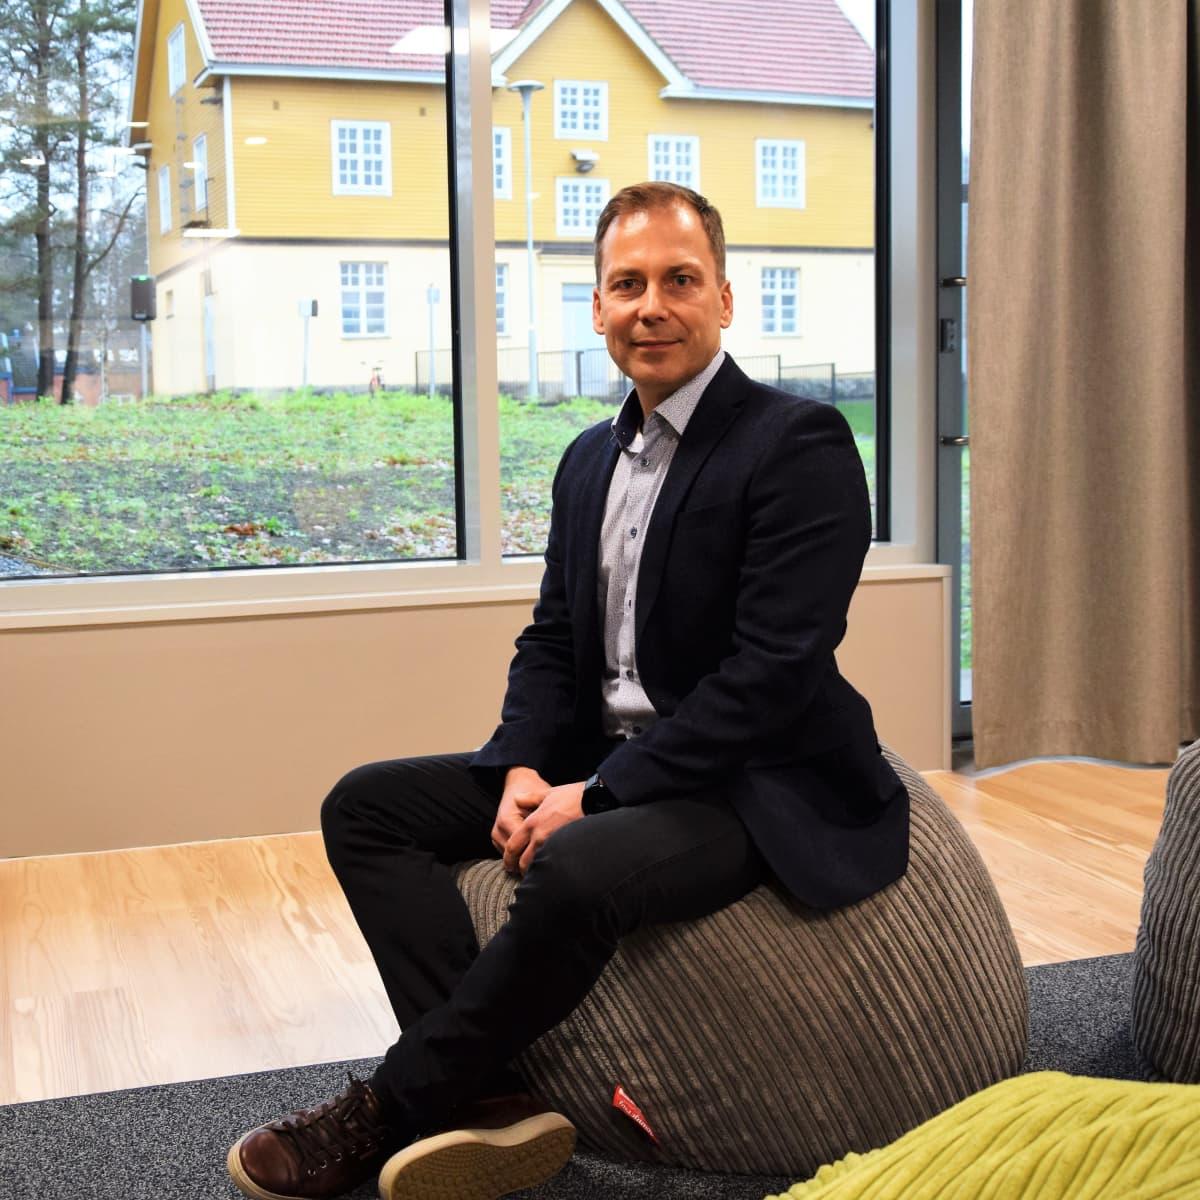 Kehitysjohtaja Jussi Ketonen, Perhekuntoutuskeskus Lauste